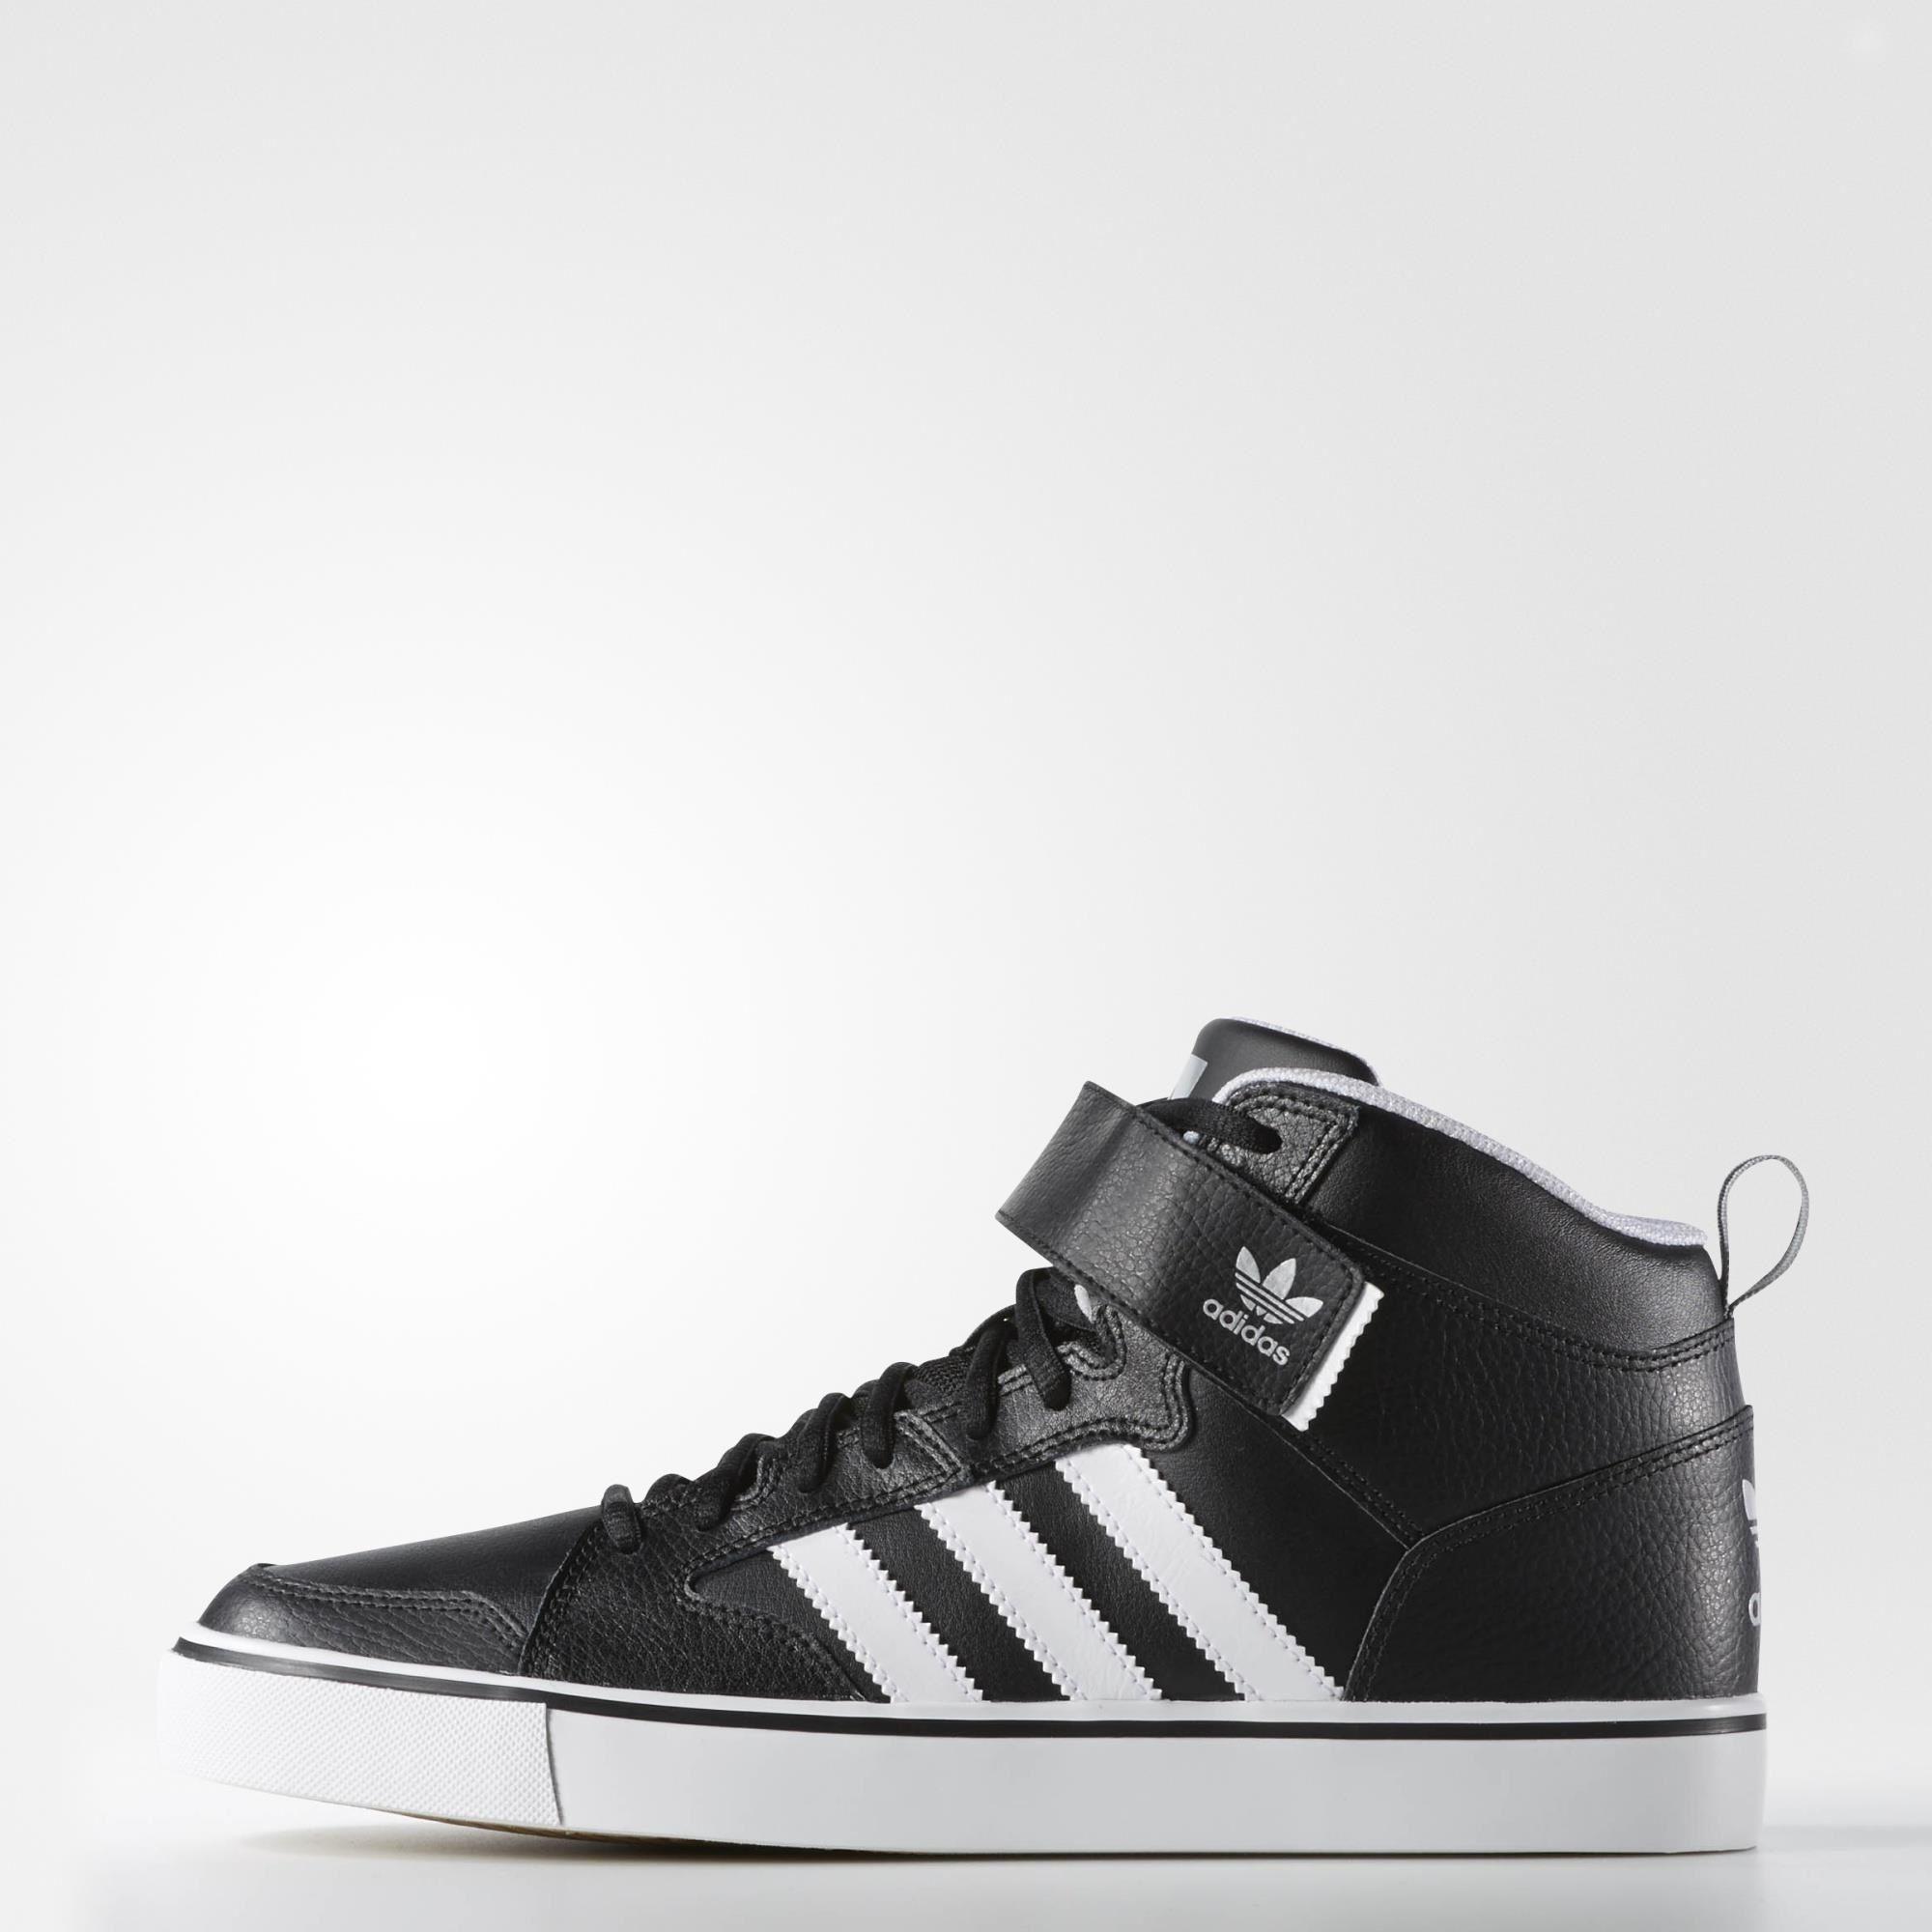 5878c0b244d adidas Varial 2.0 Mid Shoes - Black